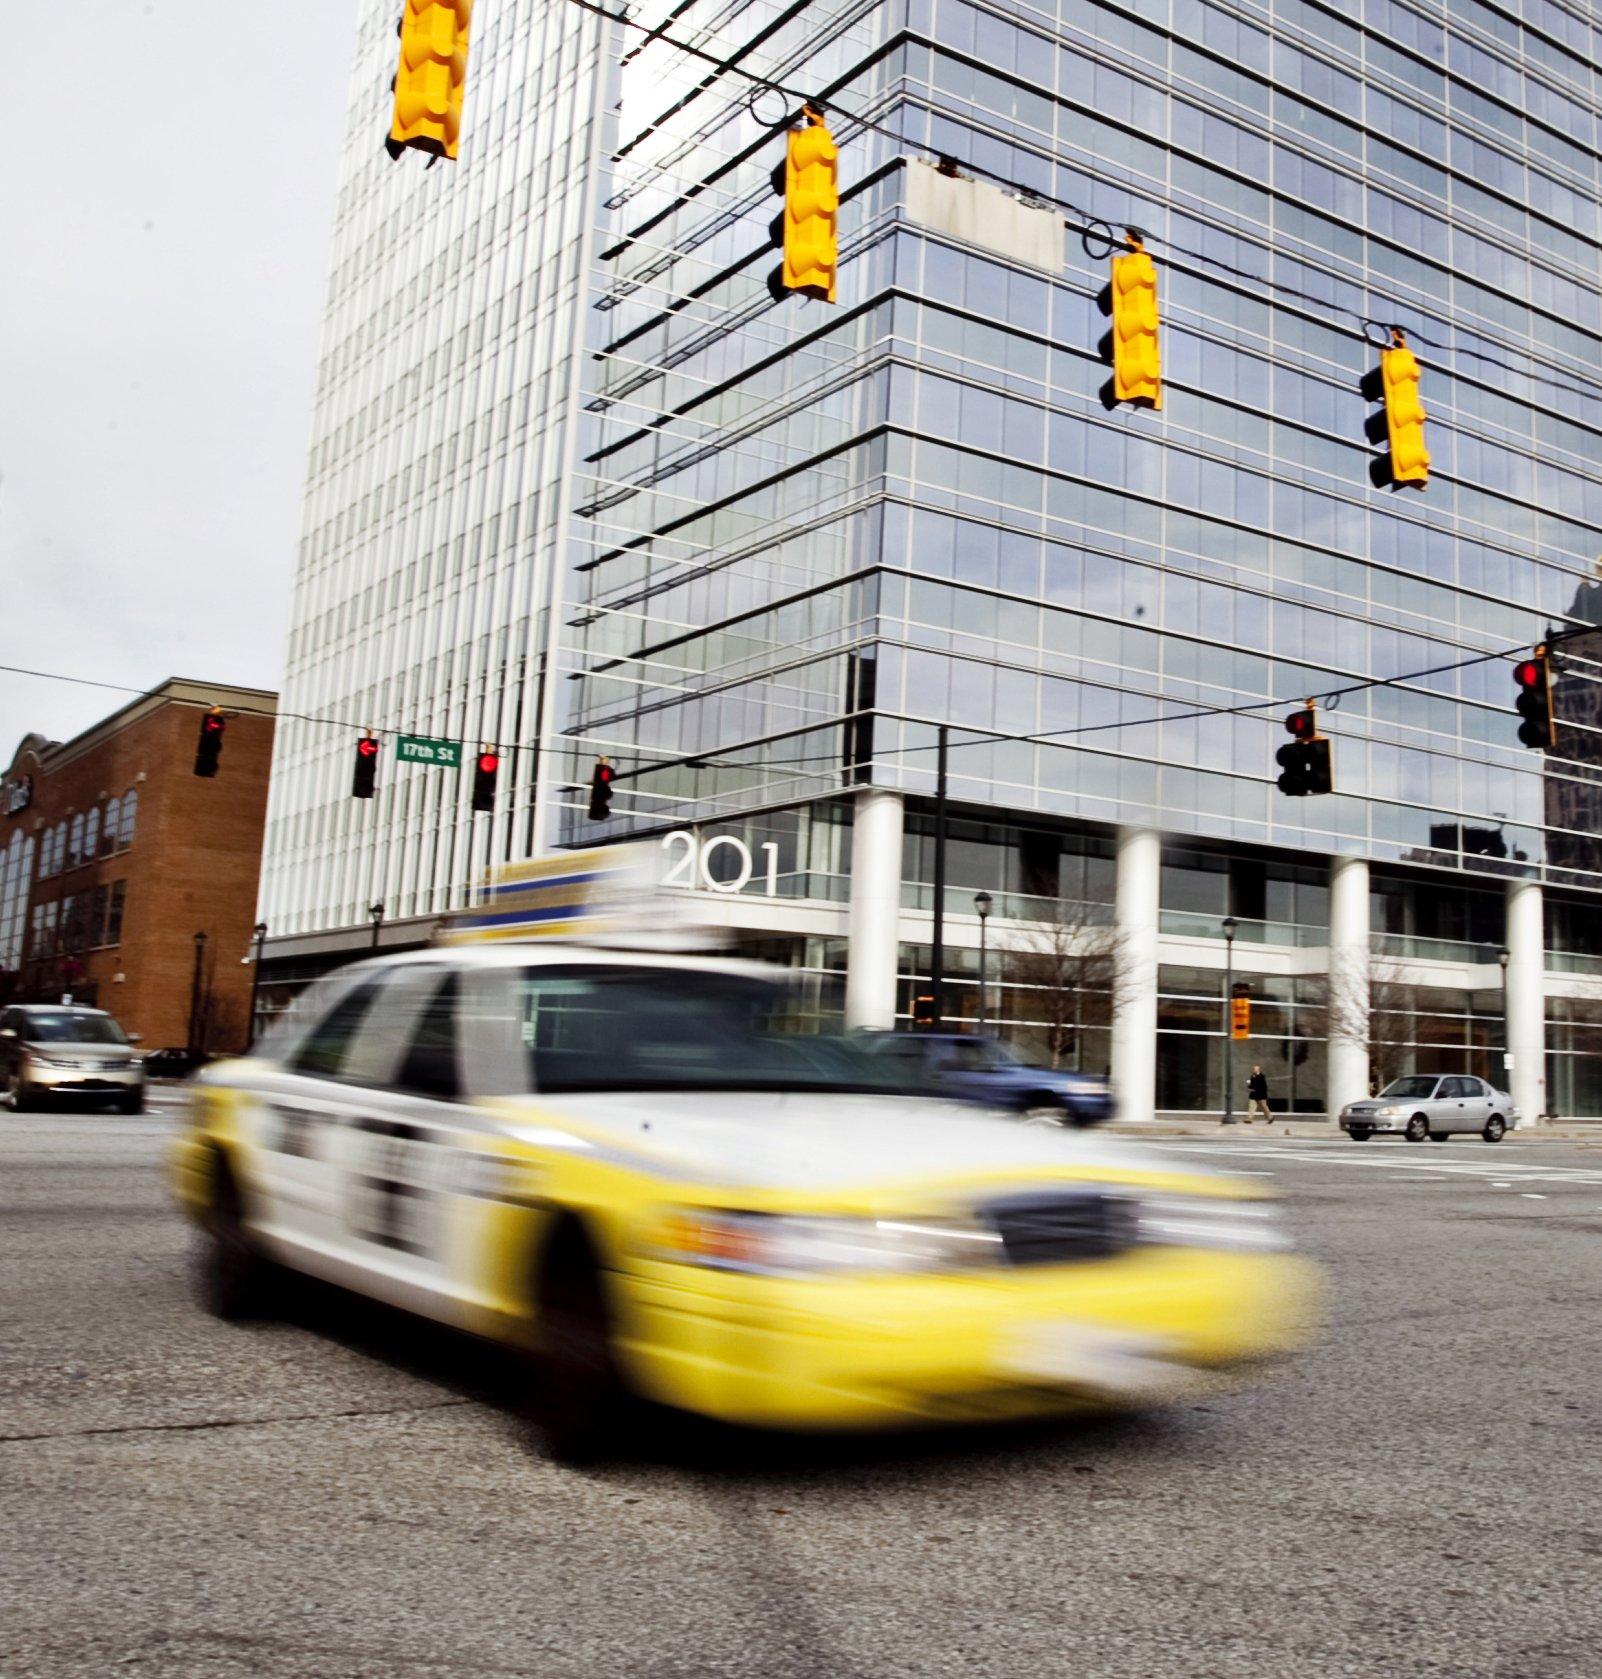 Taxi: Guaranteed Ride Home